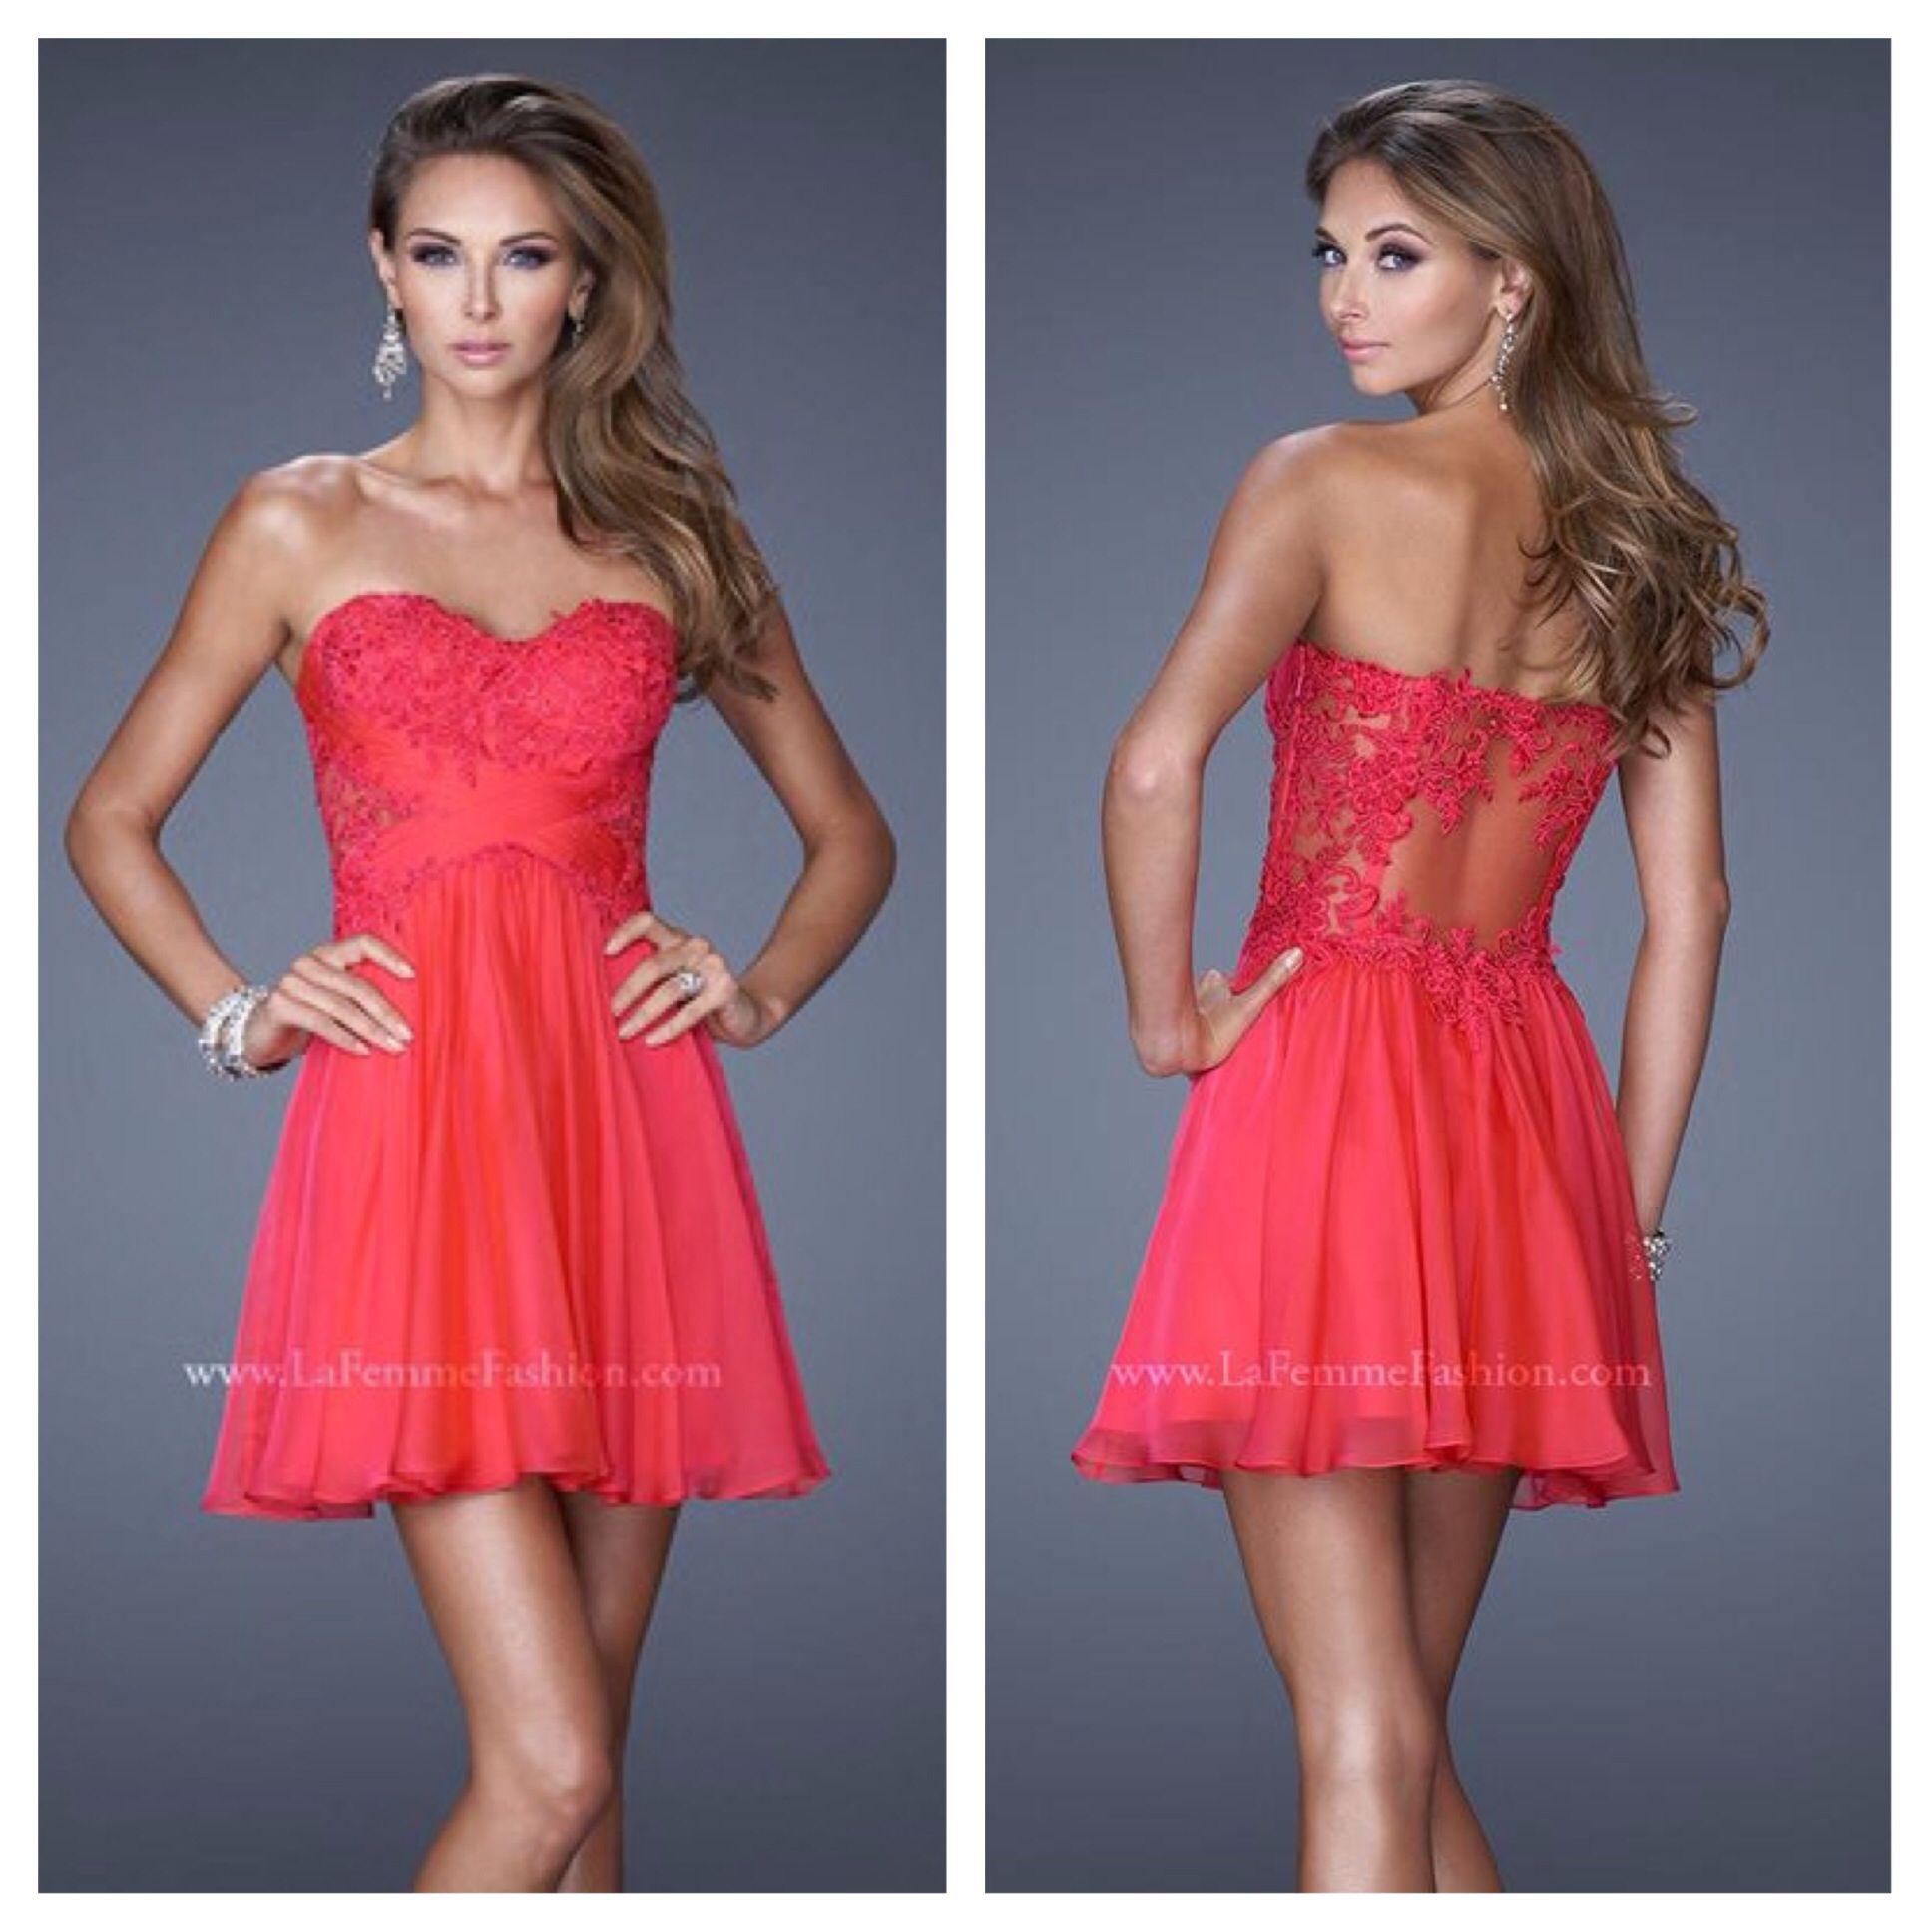 La Femme style 20632 ~ homecoming dress ~ sweetheart neckline ~ criss-cross  gathered bodice ~ sheer lace back panel ~ lace bodice ~ chiffon skirt ...